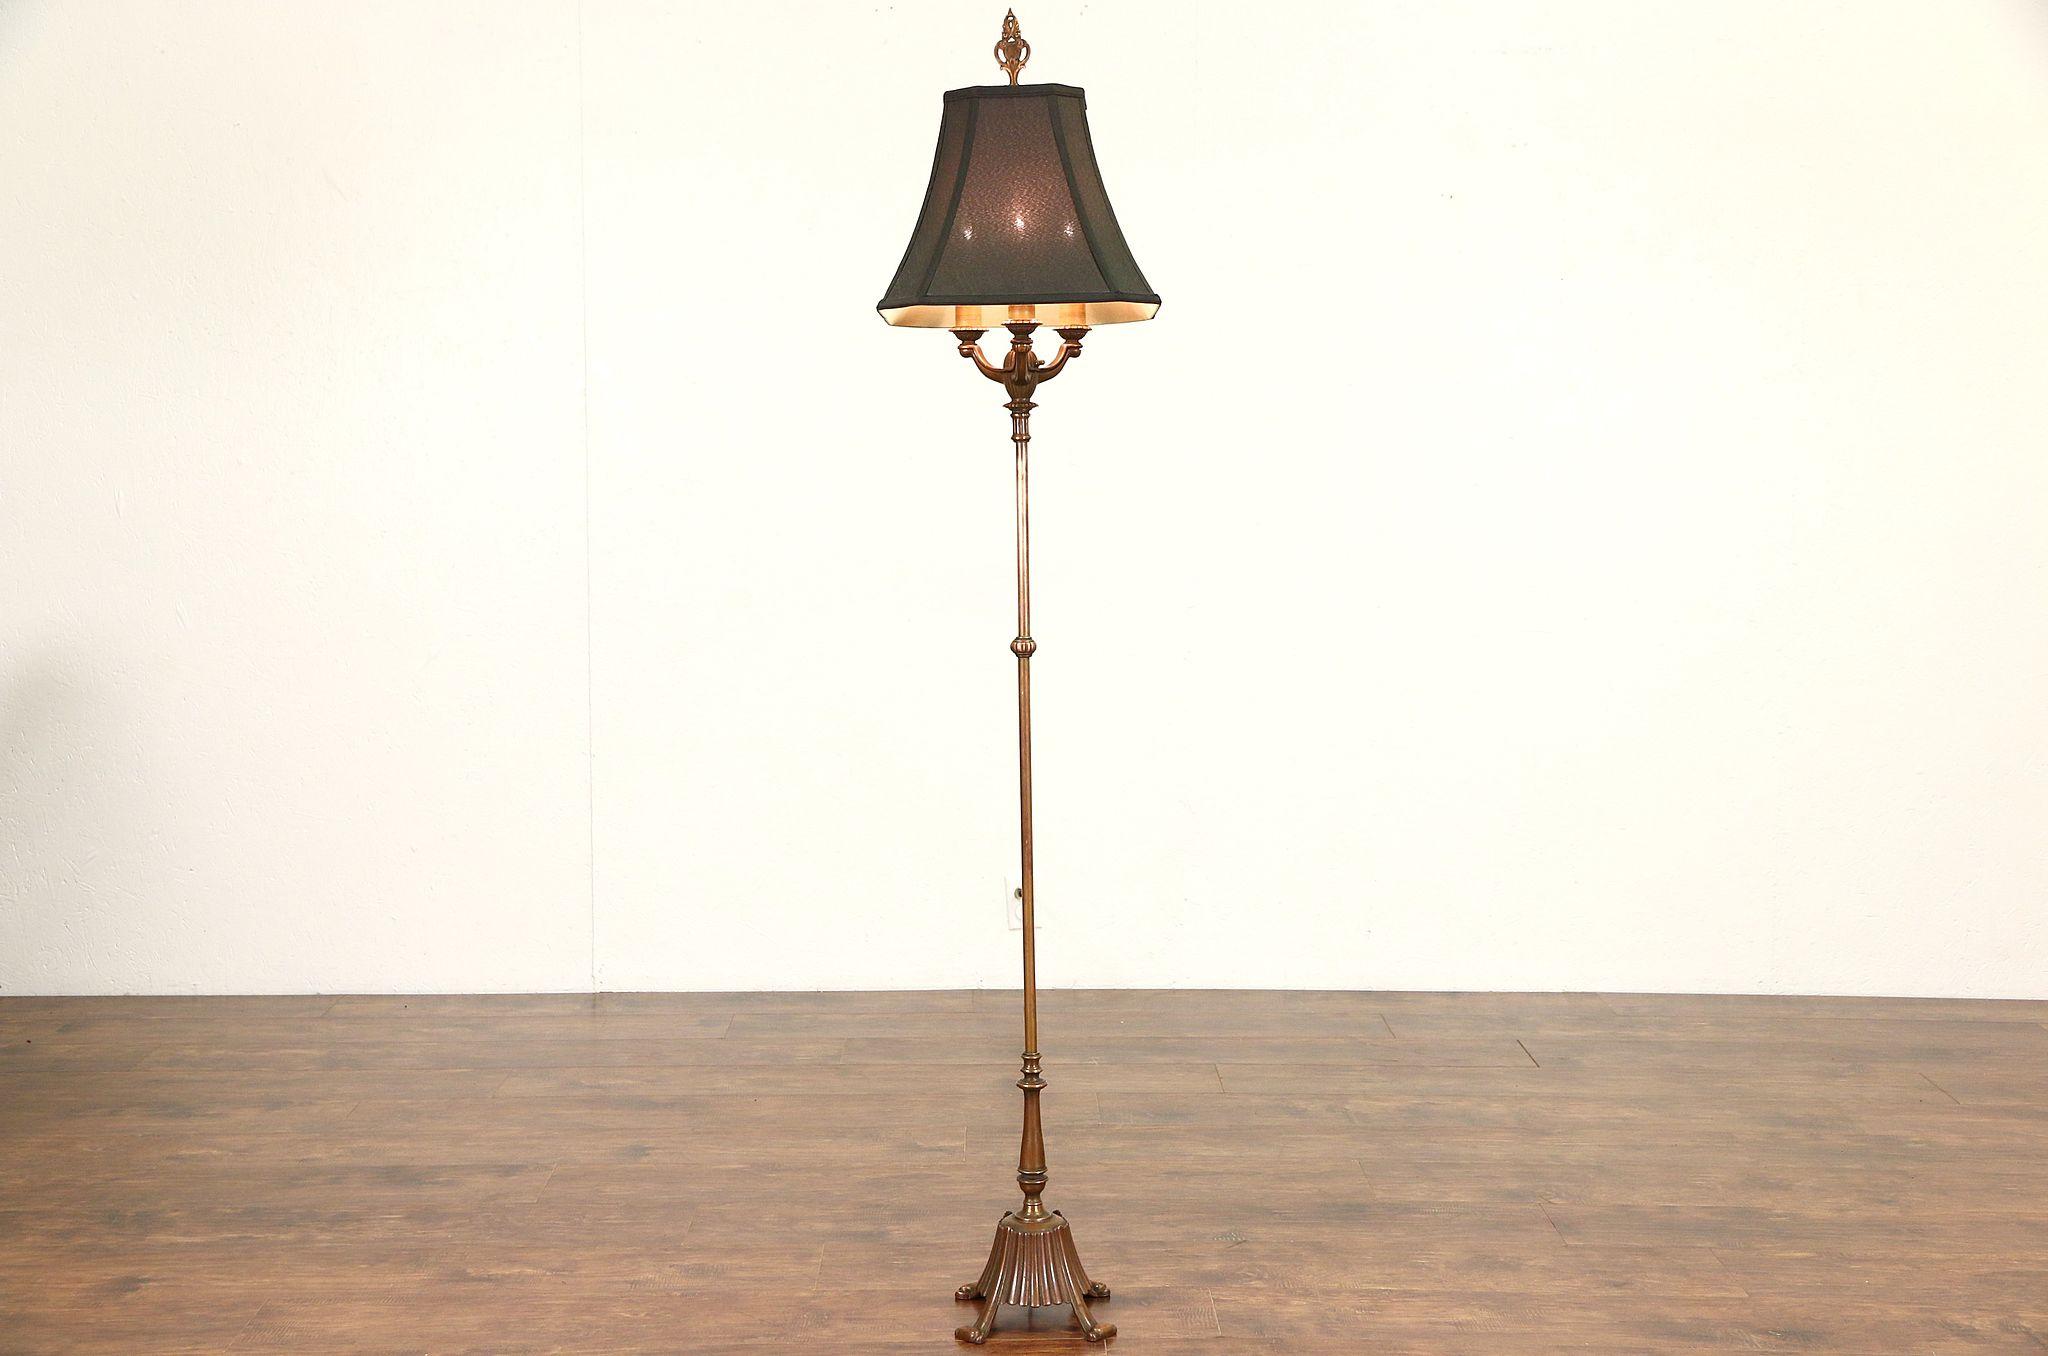 Sold Rembrandt 1920s Antique Burnished Copper Floor Lamp New